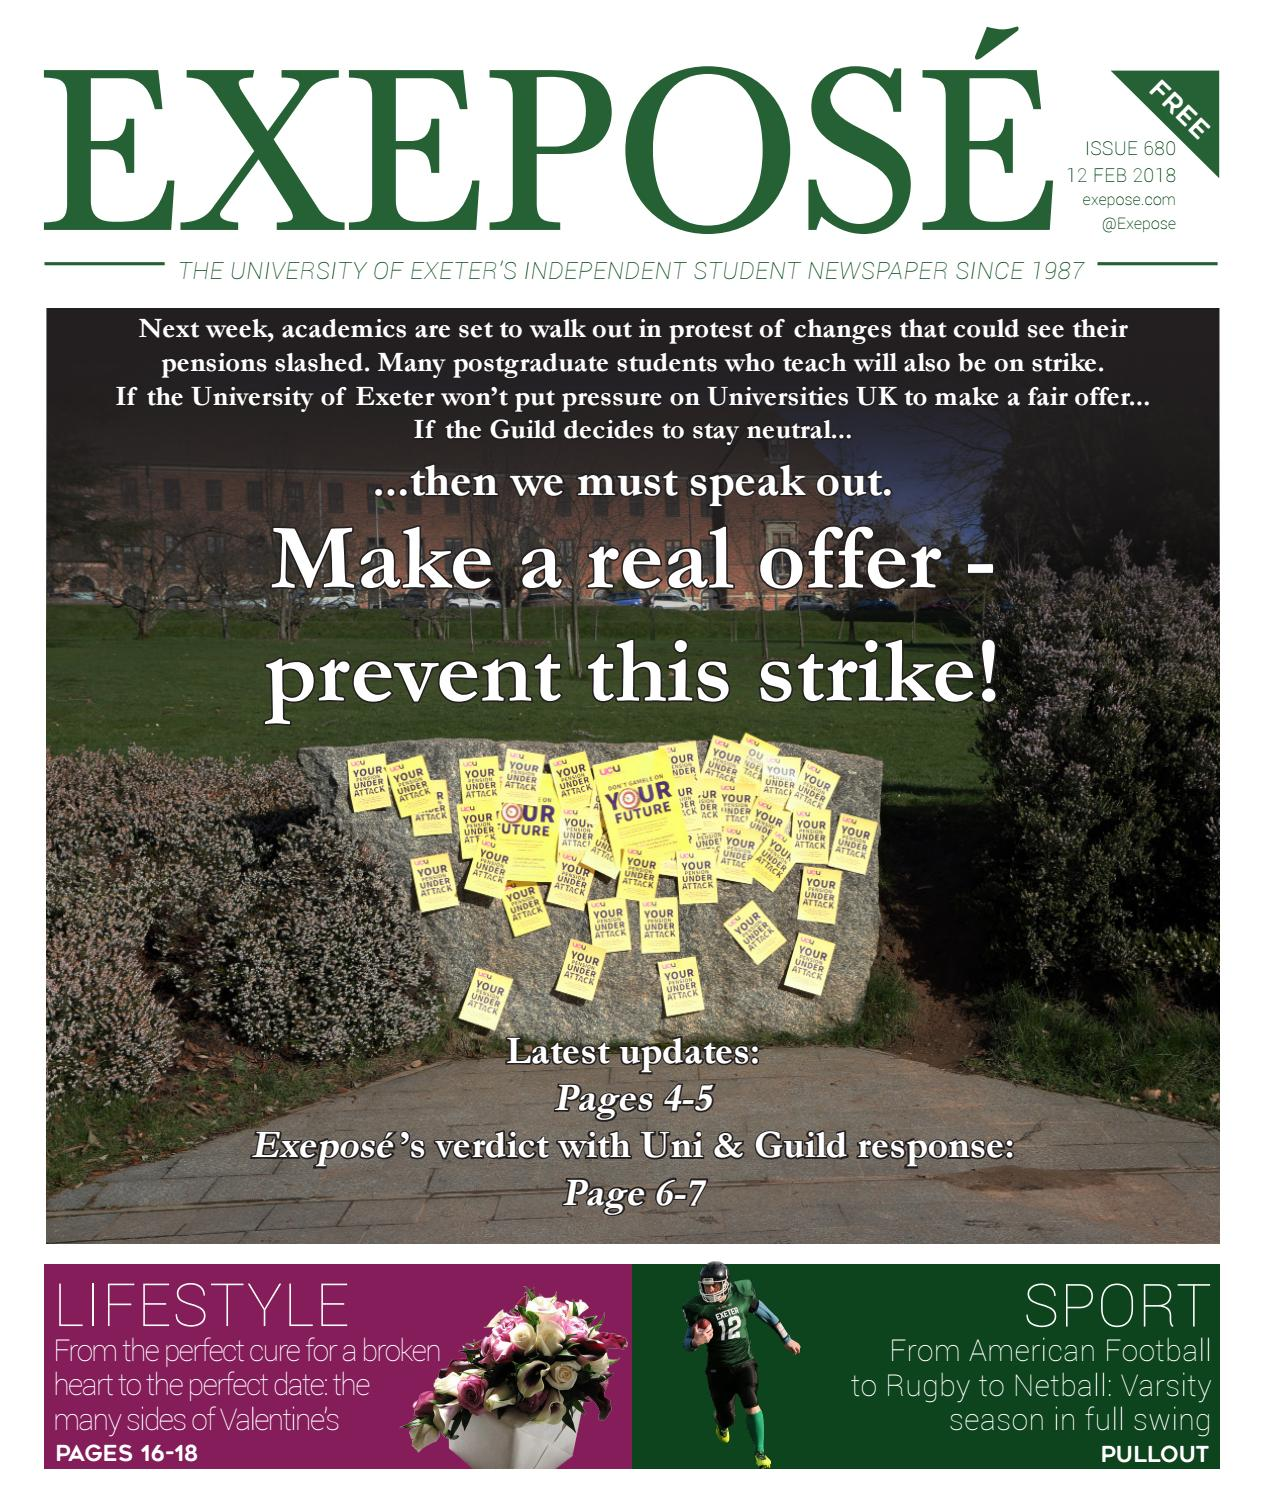 9024fa11b0a Issue 680 13 12 02 18 by Exeposé - issuu